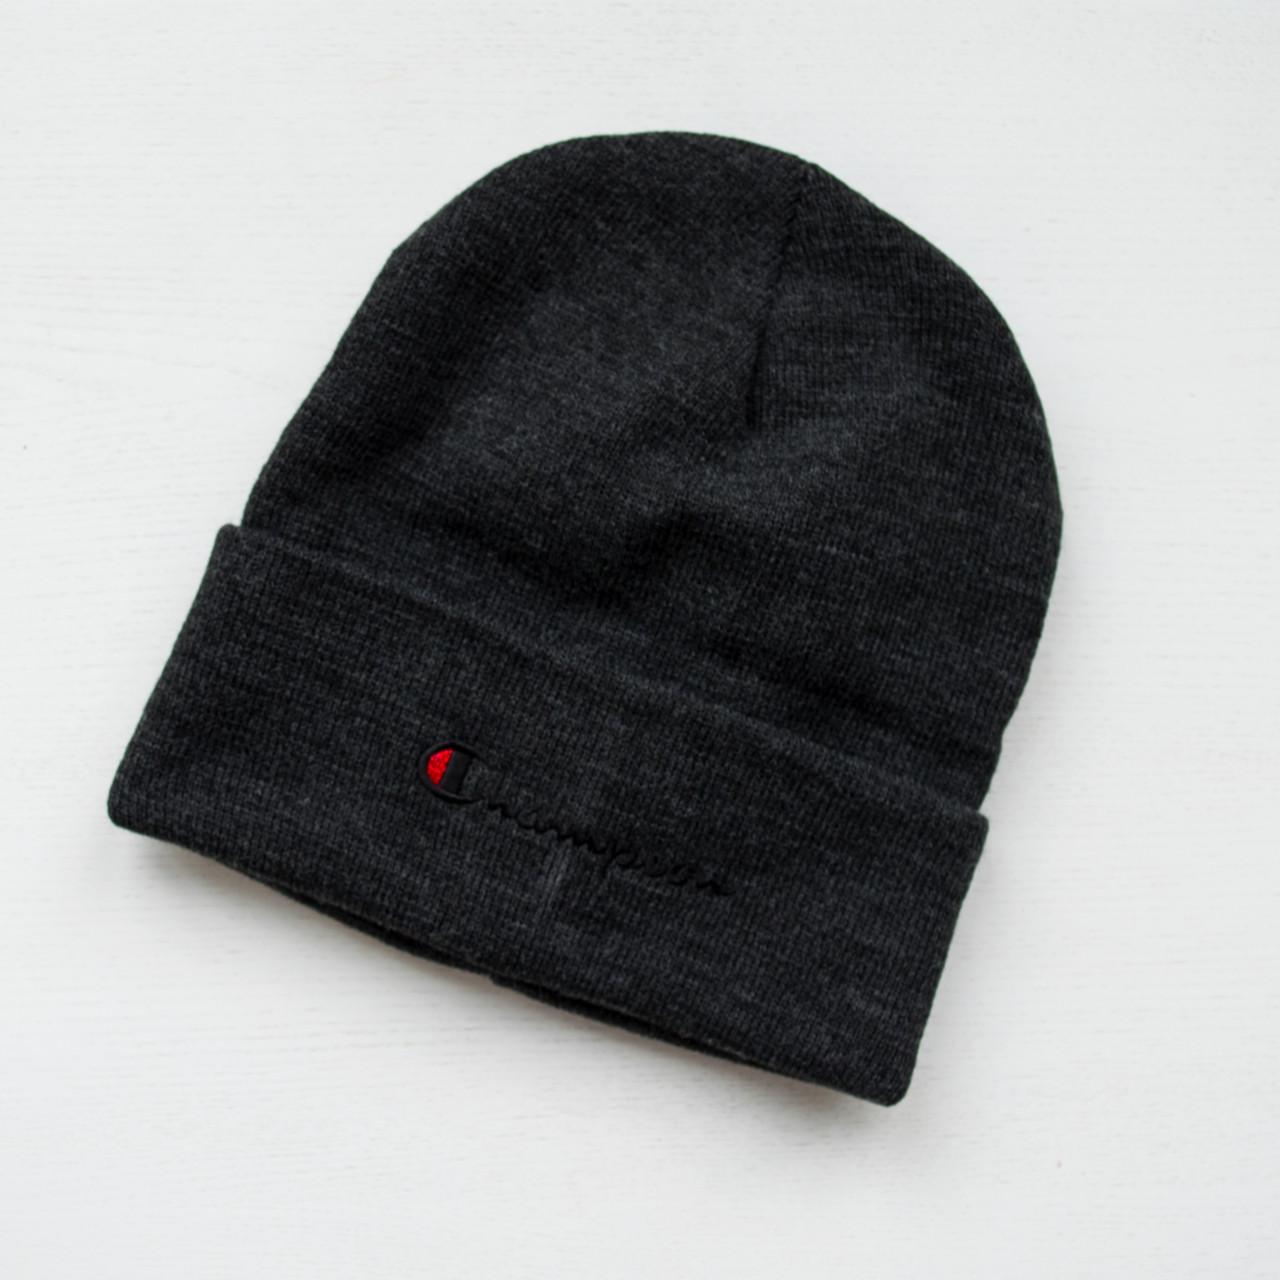 Зимняя шапка серая унисекс Champion